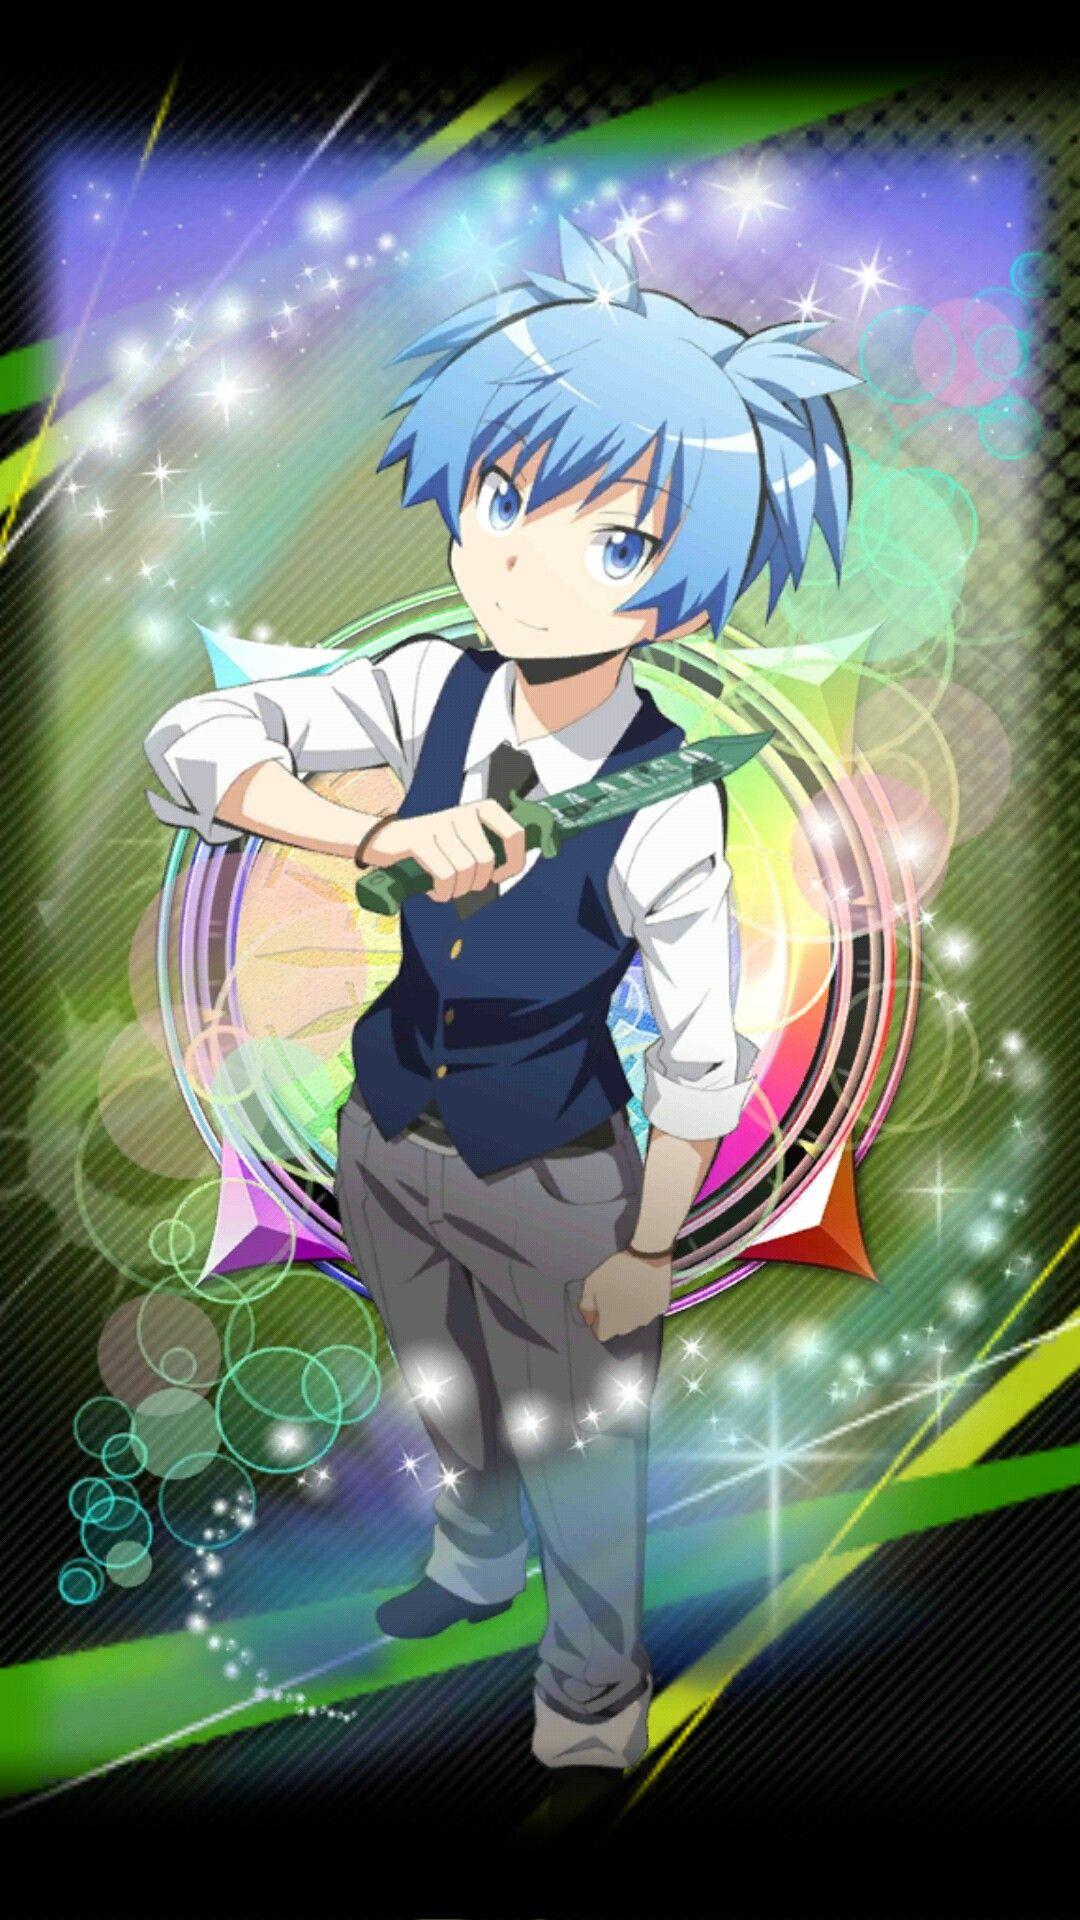 Assassination Classroom Mobile Game Card 6 star Nagisa